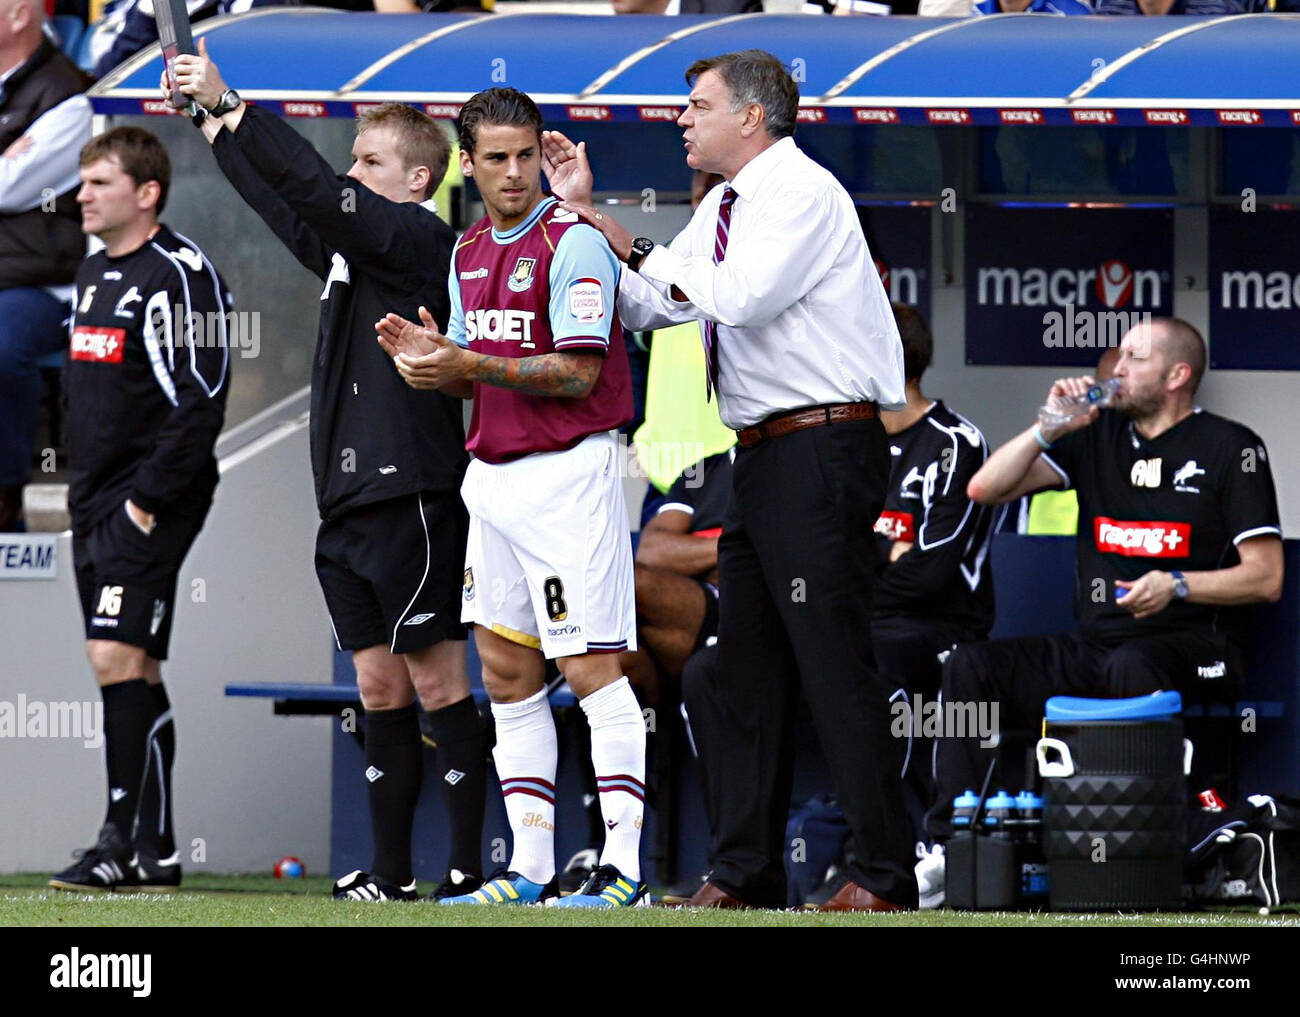 Soccer - npower Football League Championship - Millwall v West Ham United - The Den - Stock Image